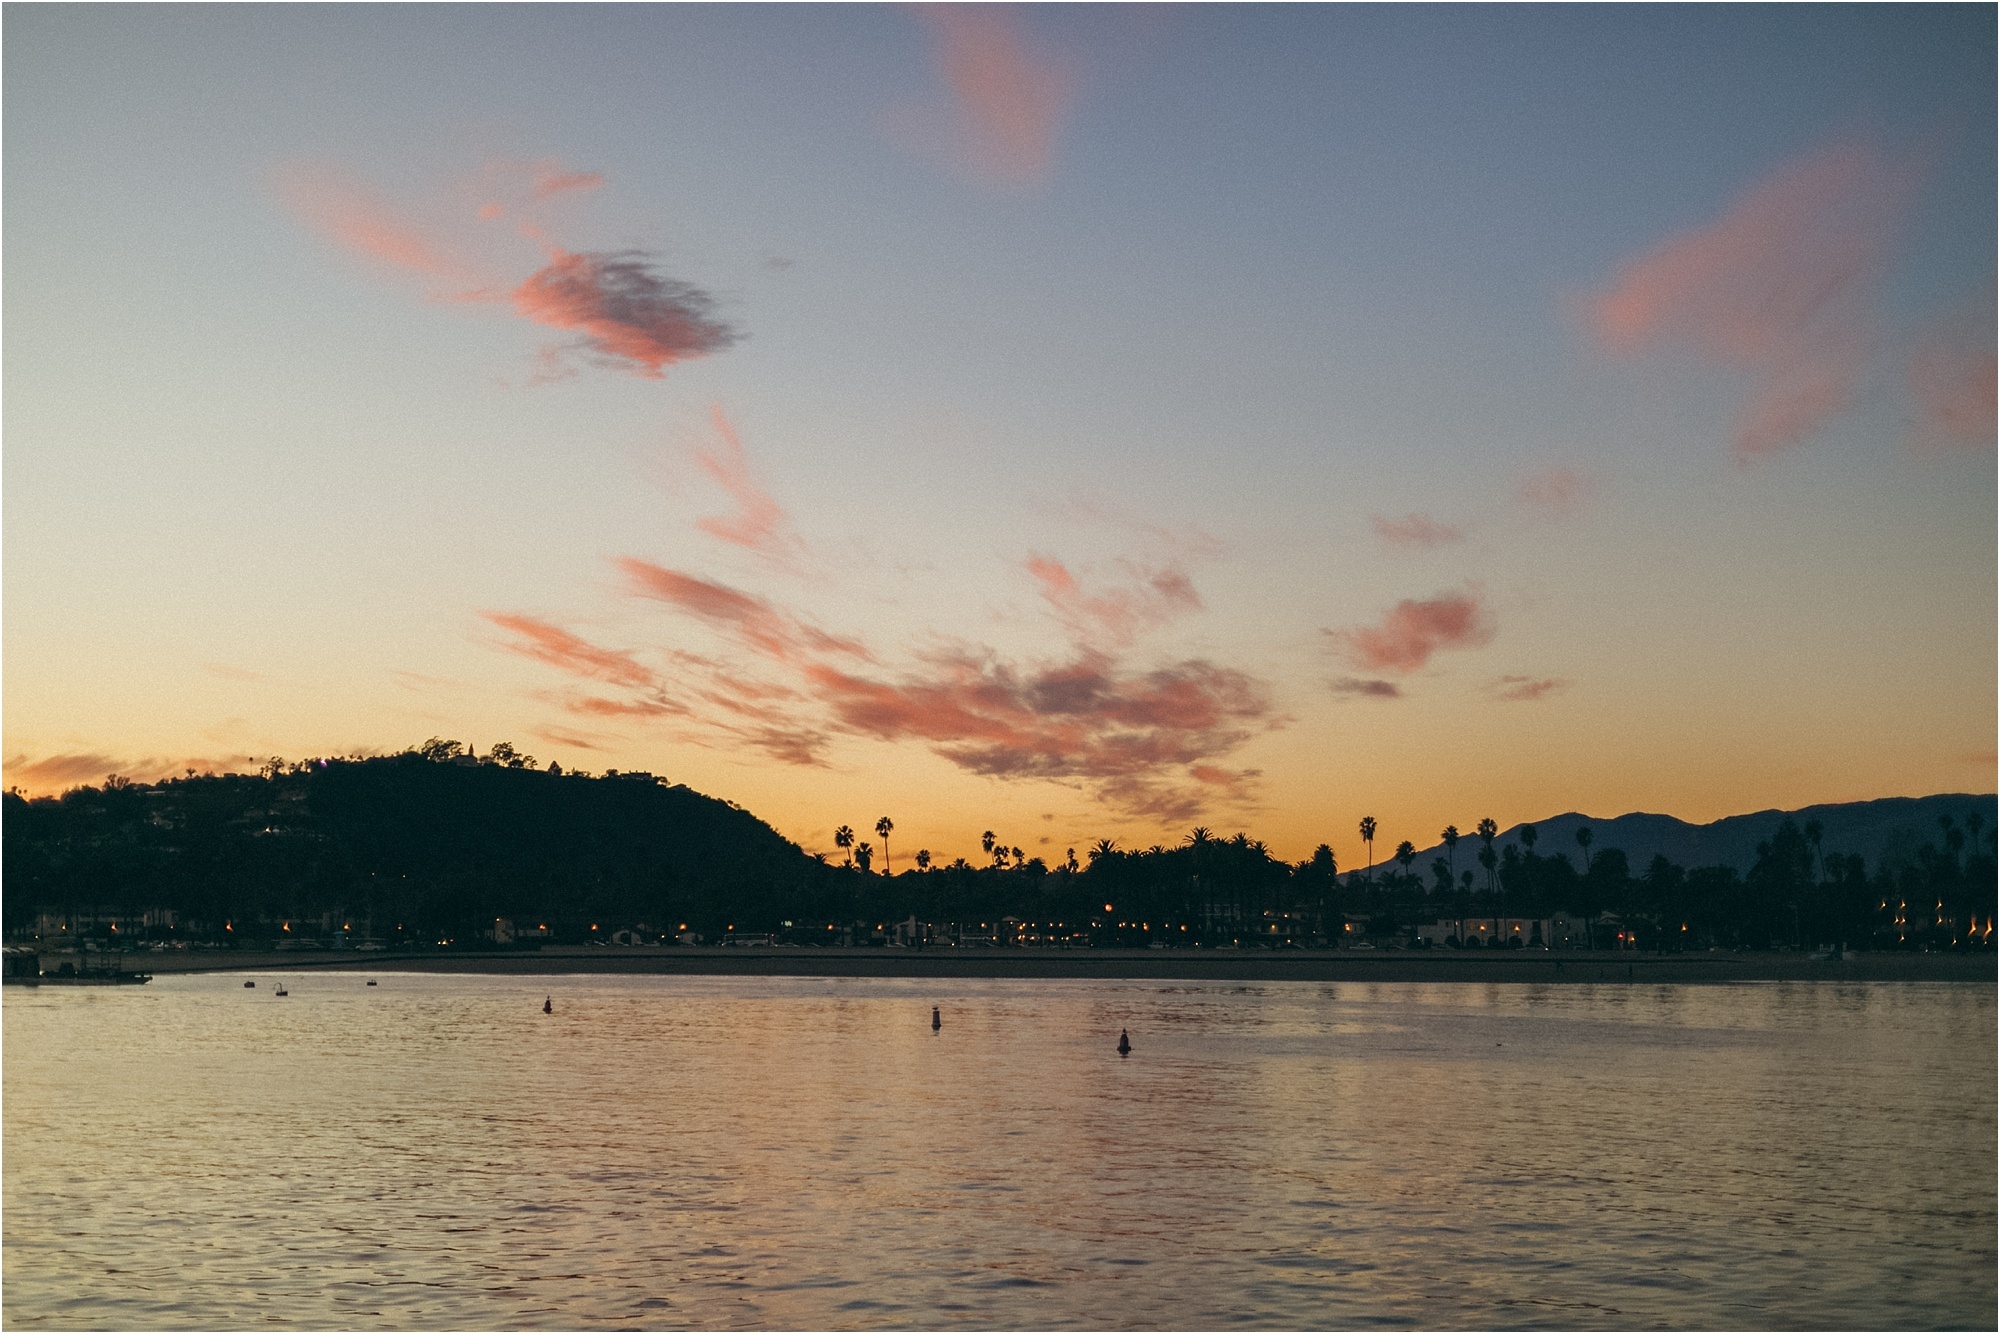 angie-diaz-photography-santa-barbara-courthouse-california-hawaii-wedding-photographer_0096.jpg